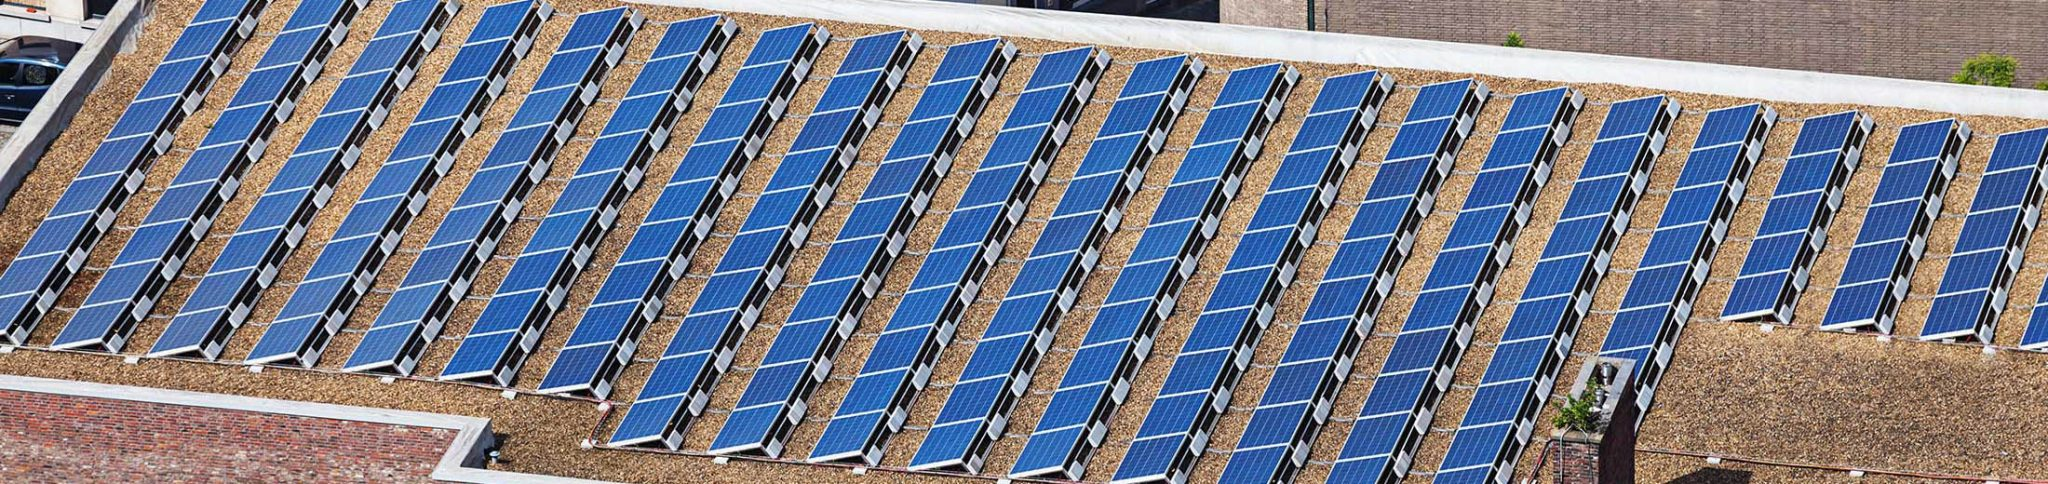 Solar panels on community building